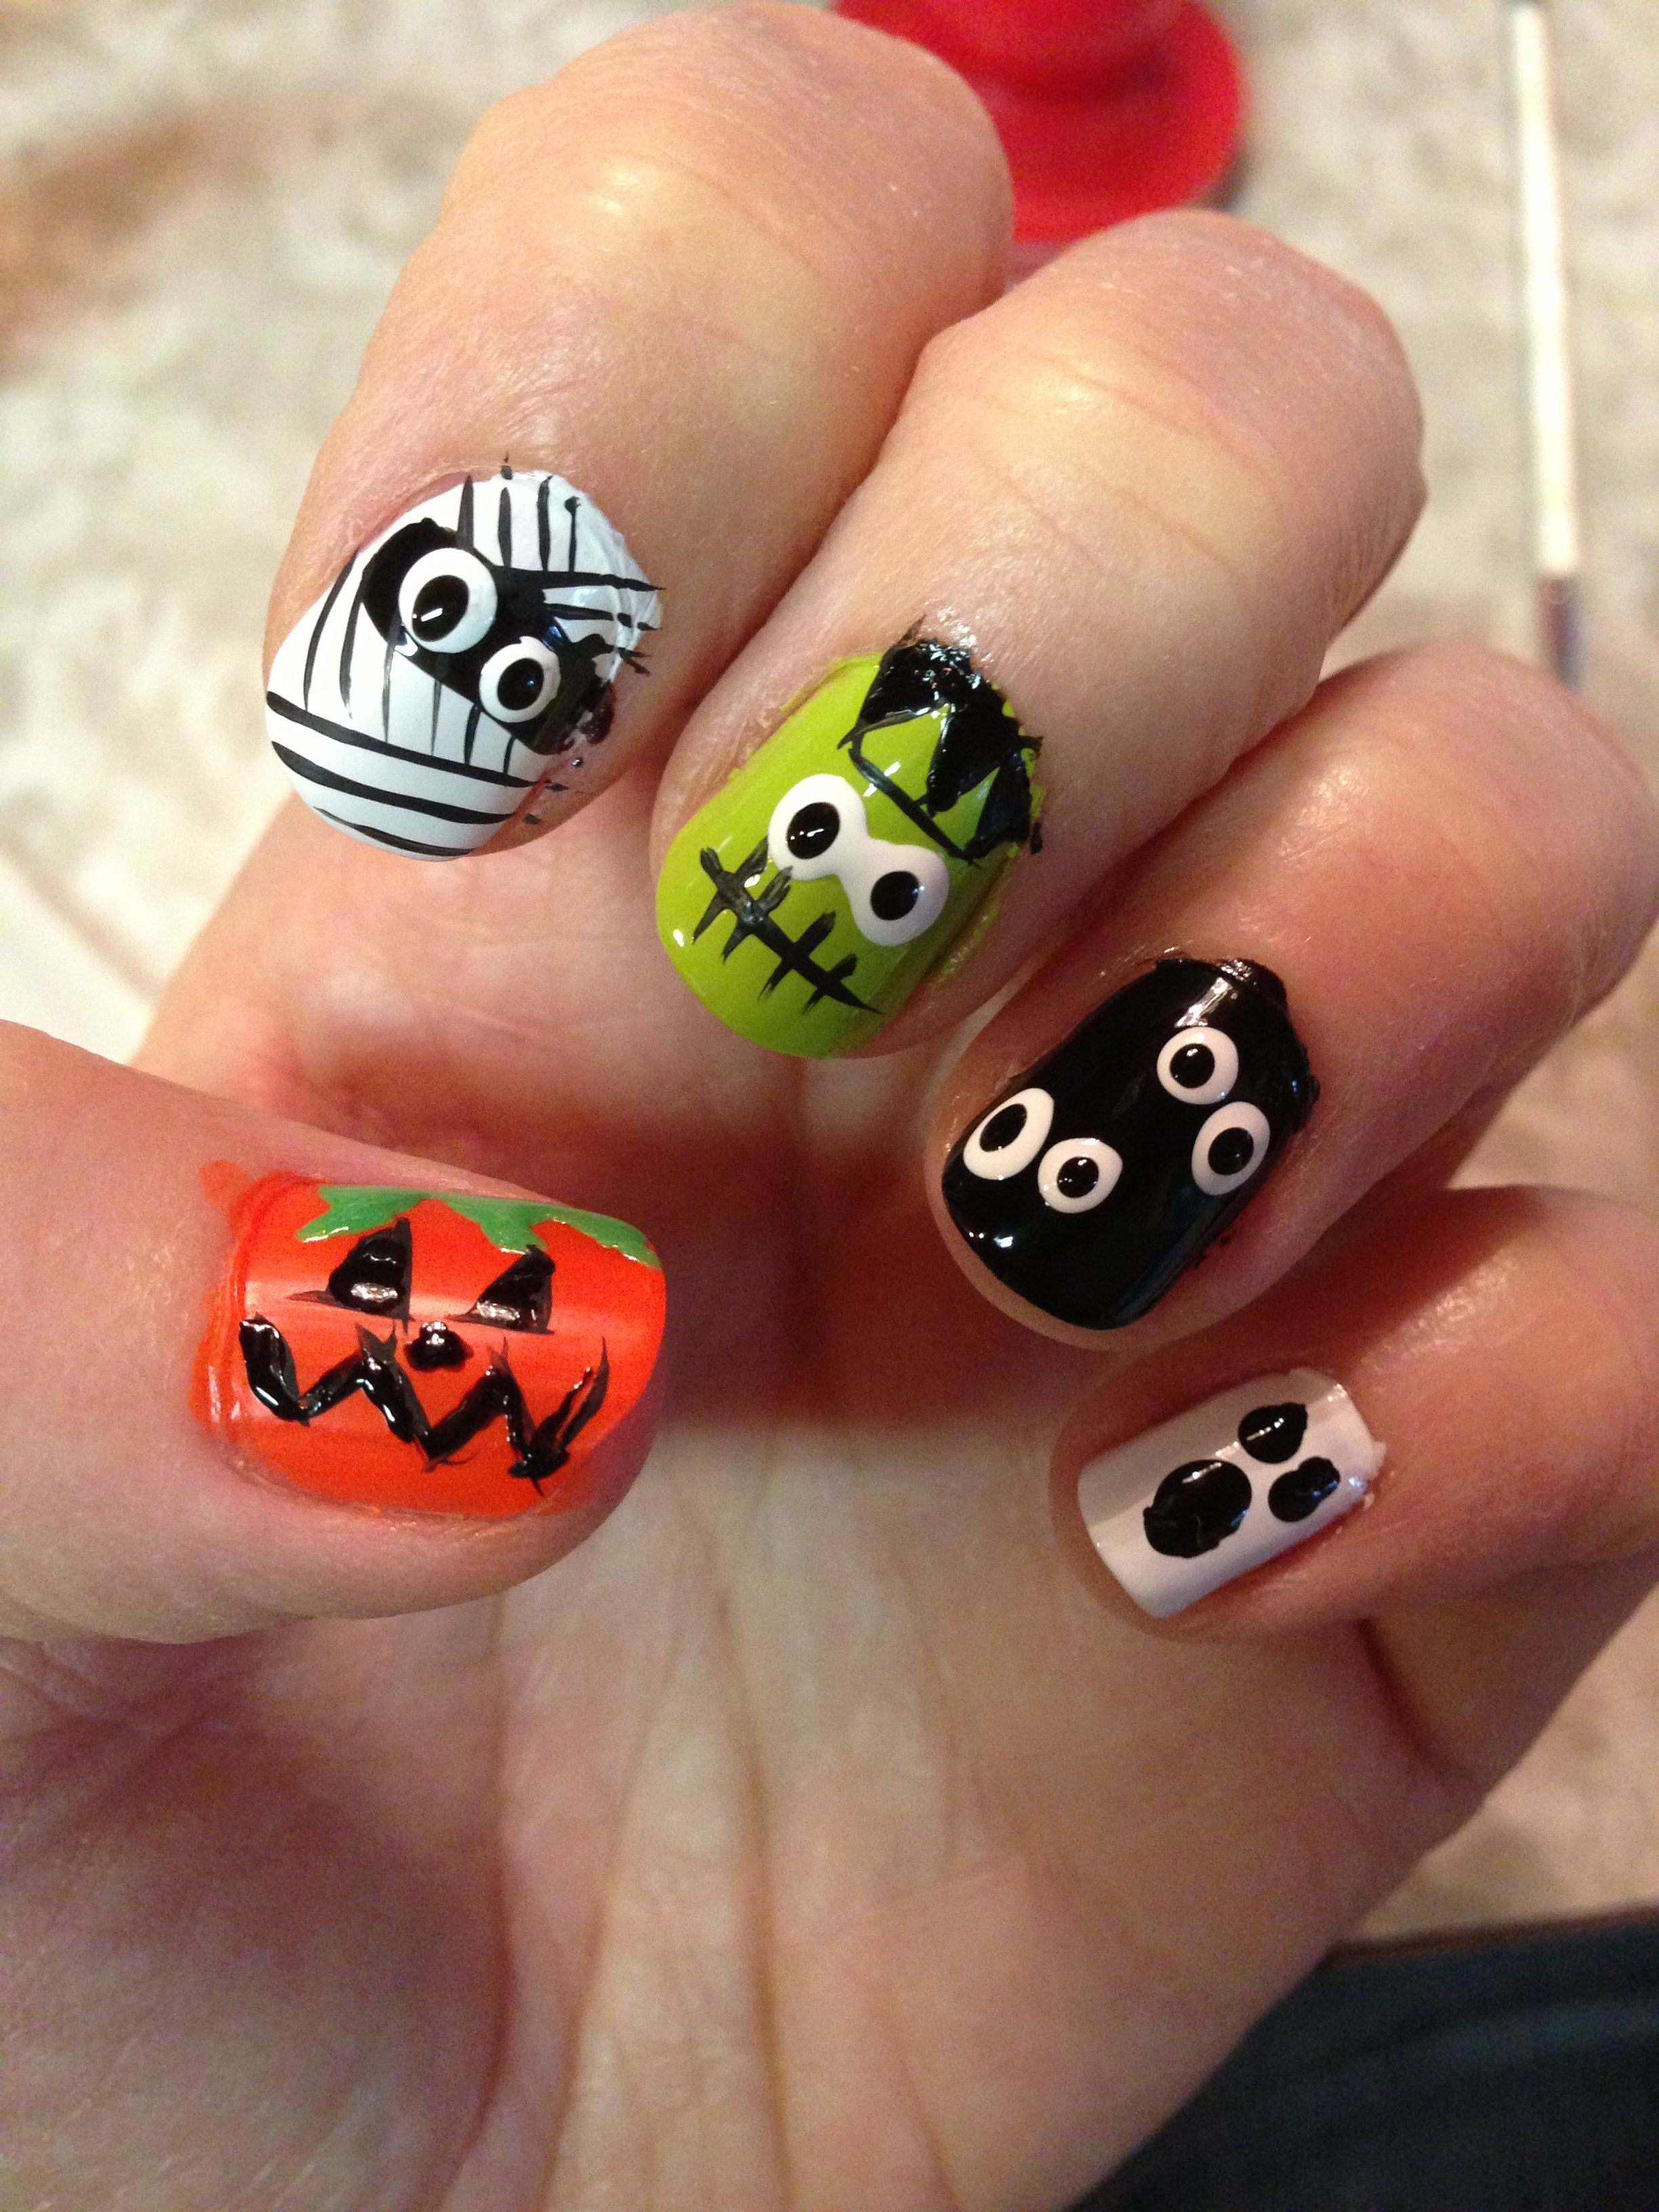 Halloween nails | I did it & Pinterest hay-elped! | Pinterest | Nail ...